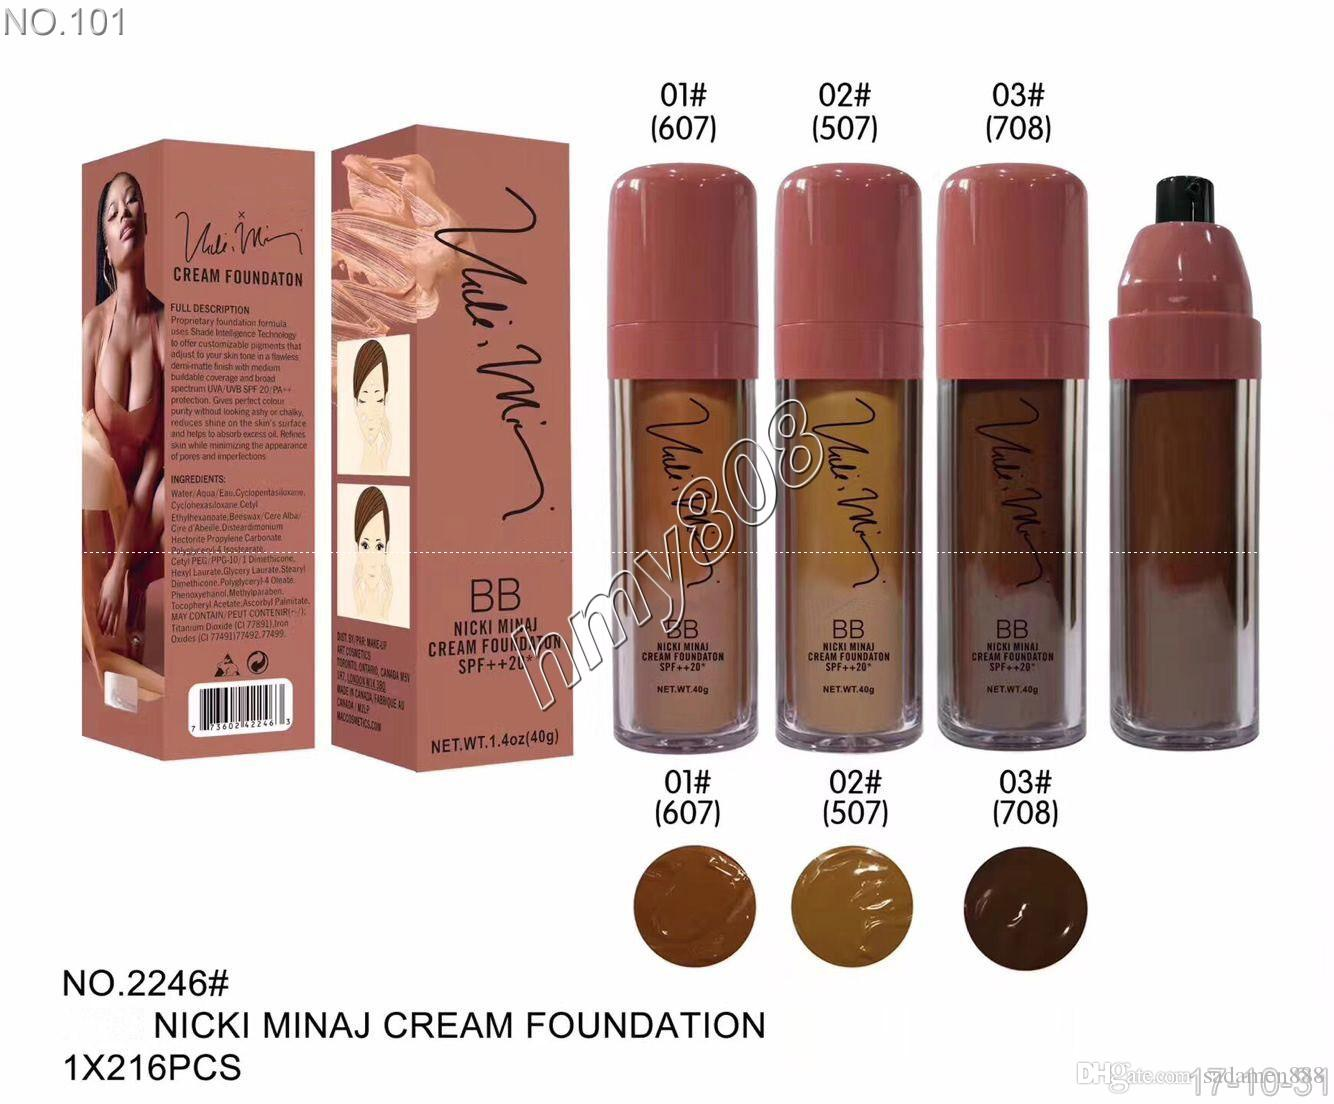 NUEVO Maquillaje BB Nicki Minaj Cream Foundation SPF ++ 20 Impermeable Face Powder Foundation Liquid es